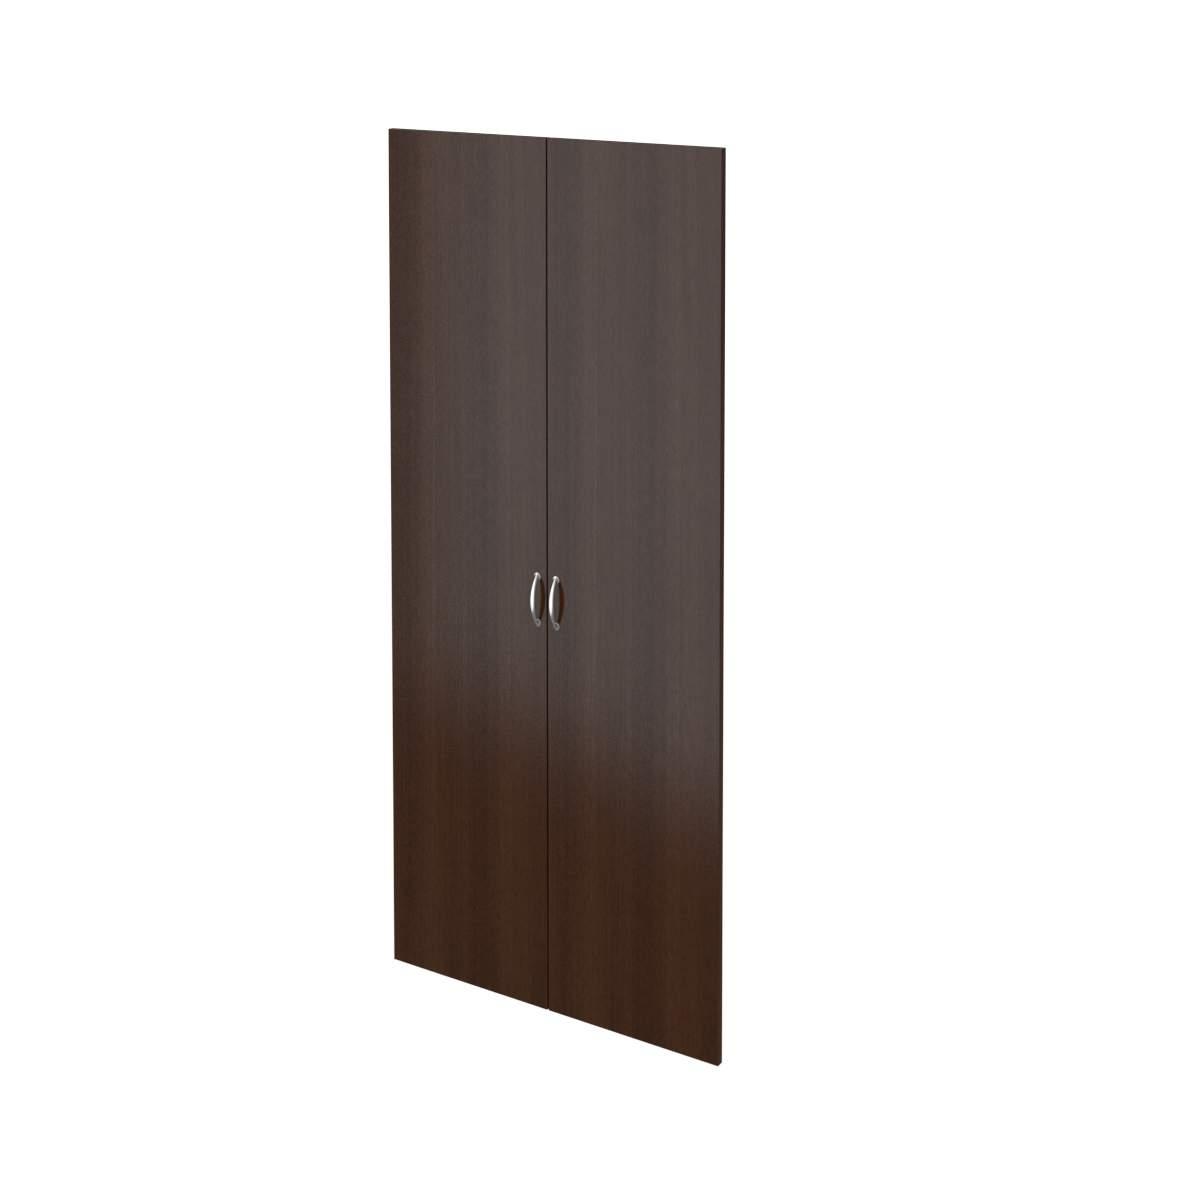 Двери ЛДСП высокие 762х16х1852